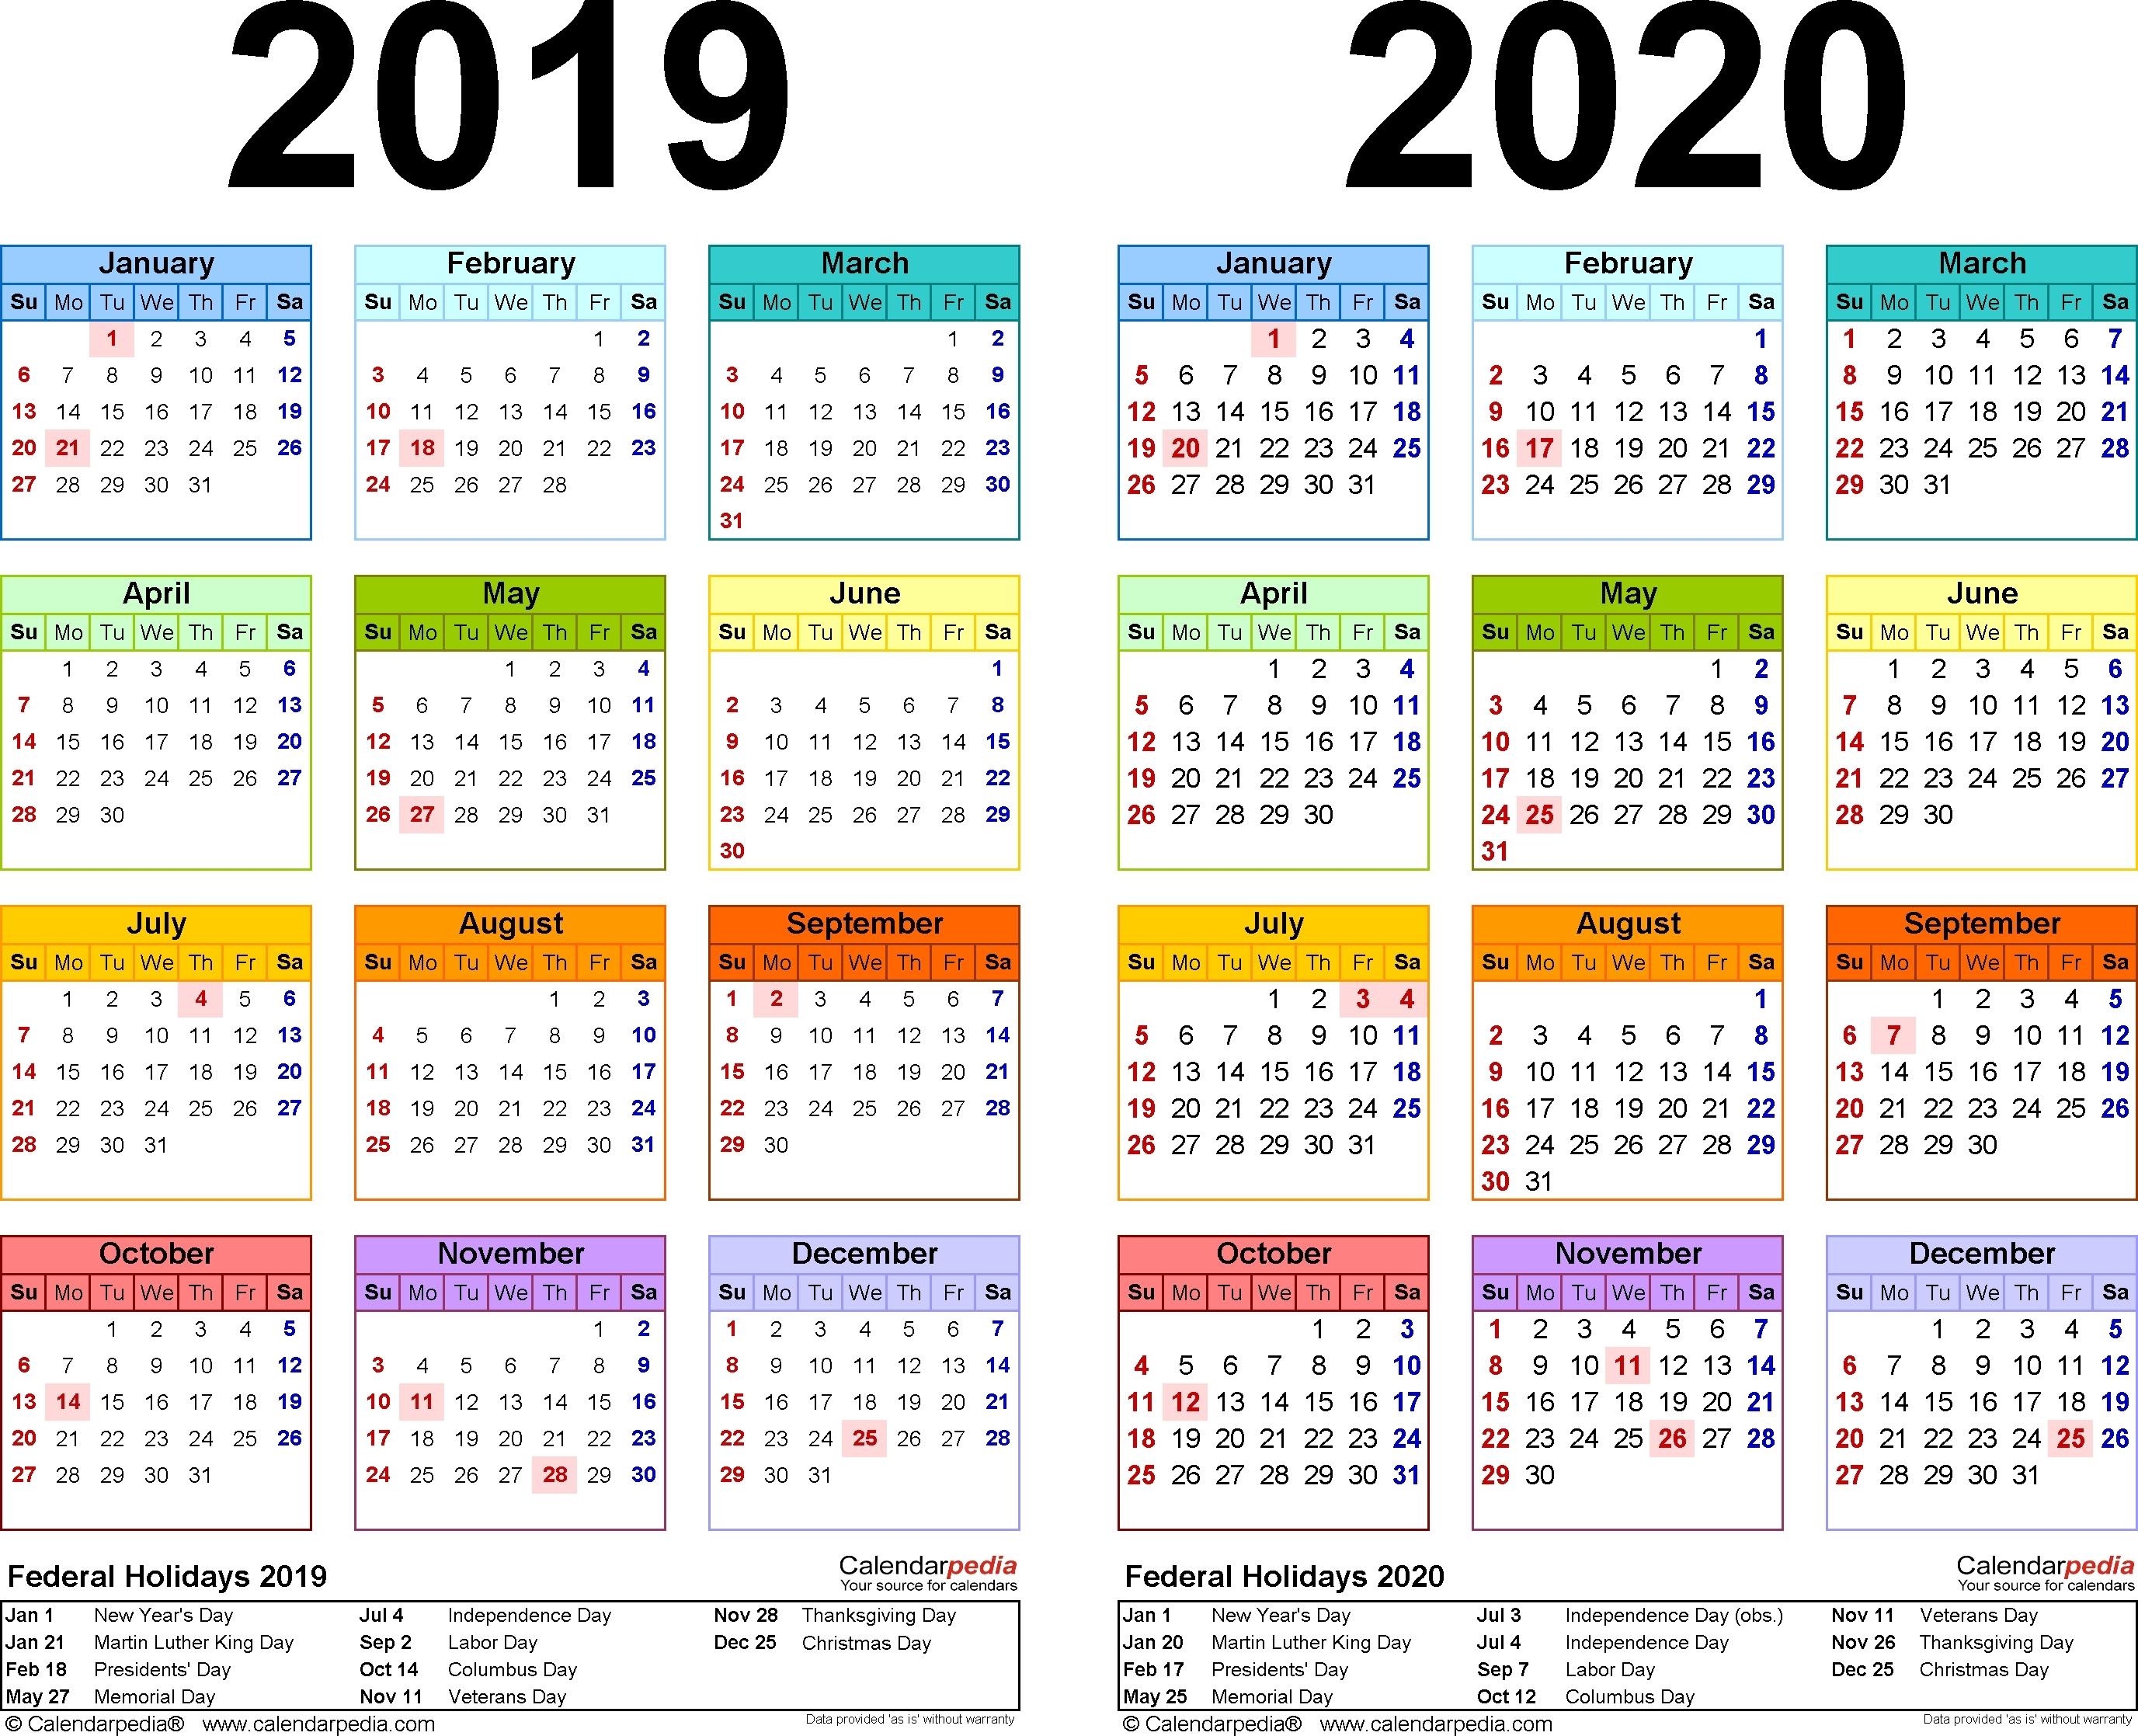 Perpetual Depo Provera Calculator  Depo Calendar Online